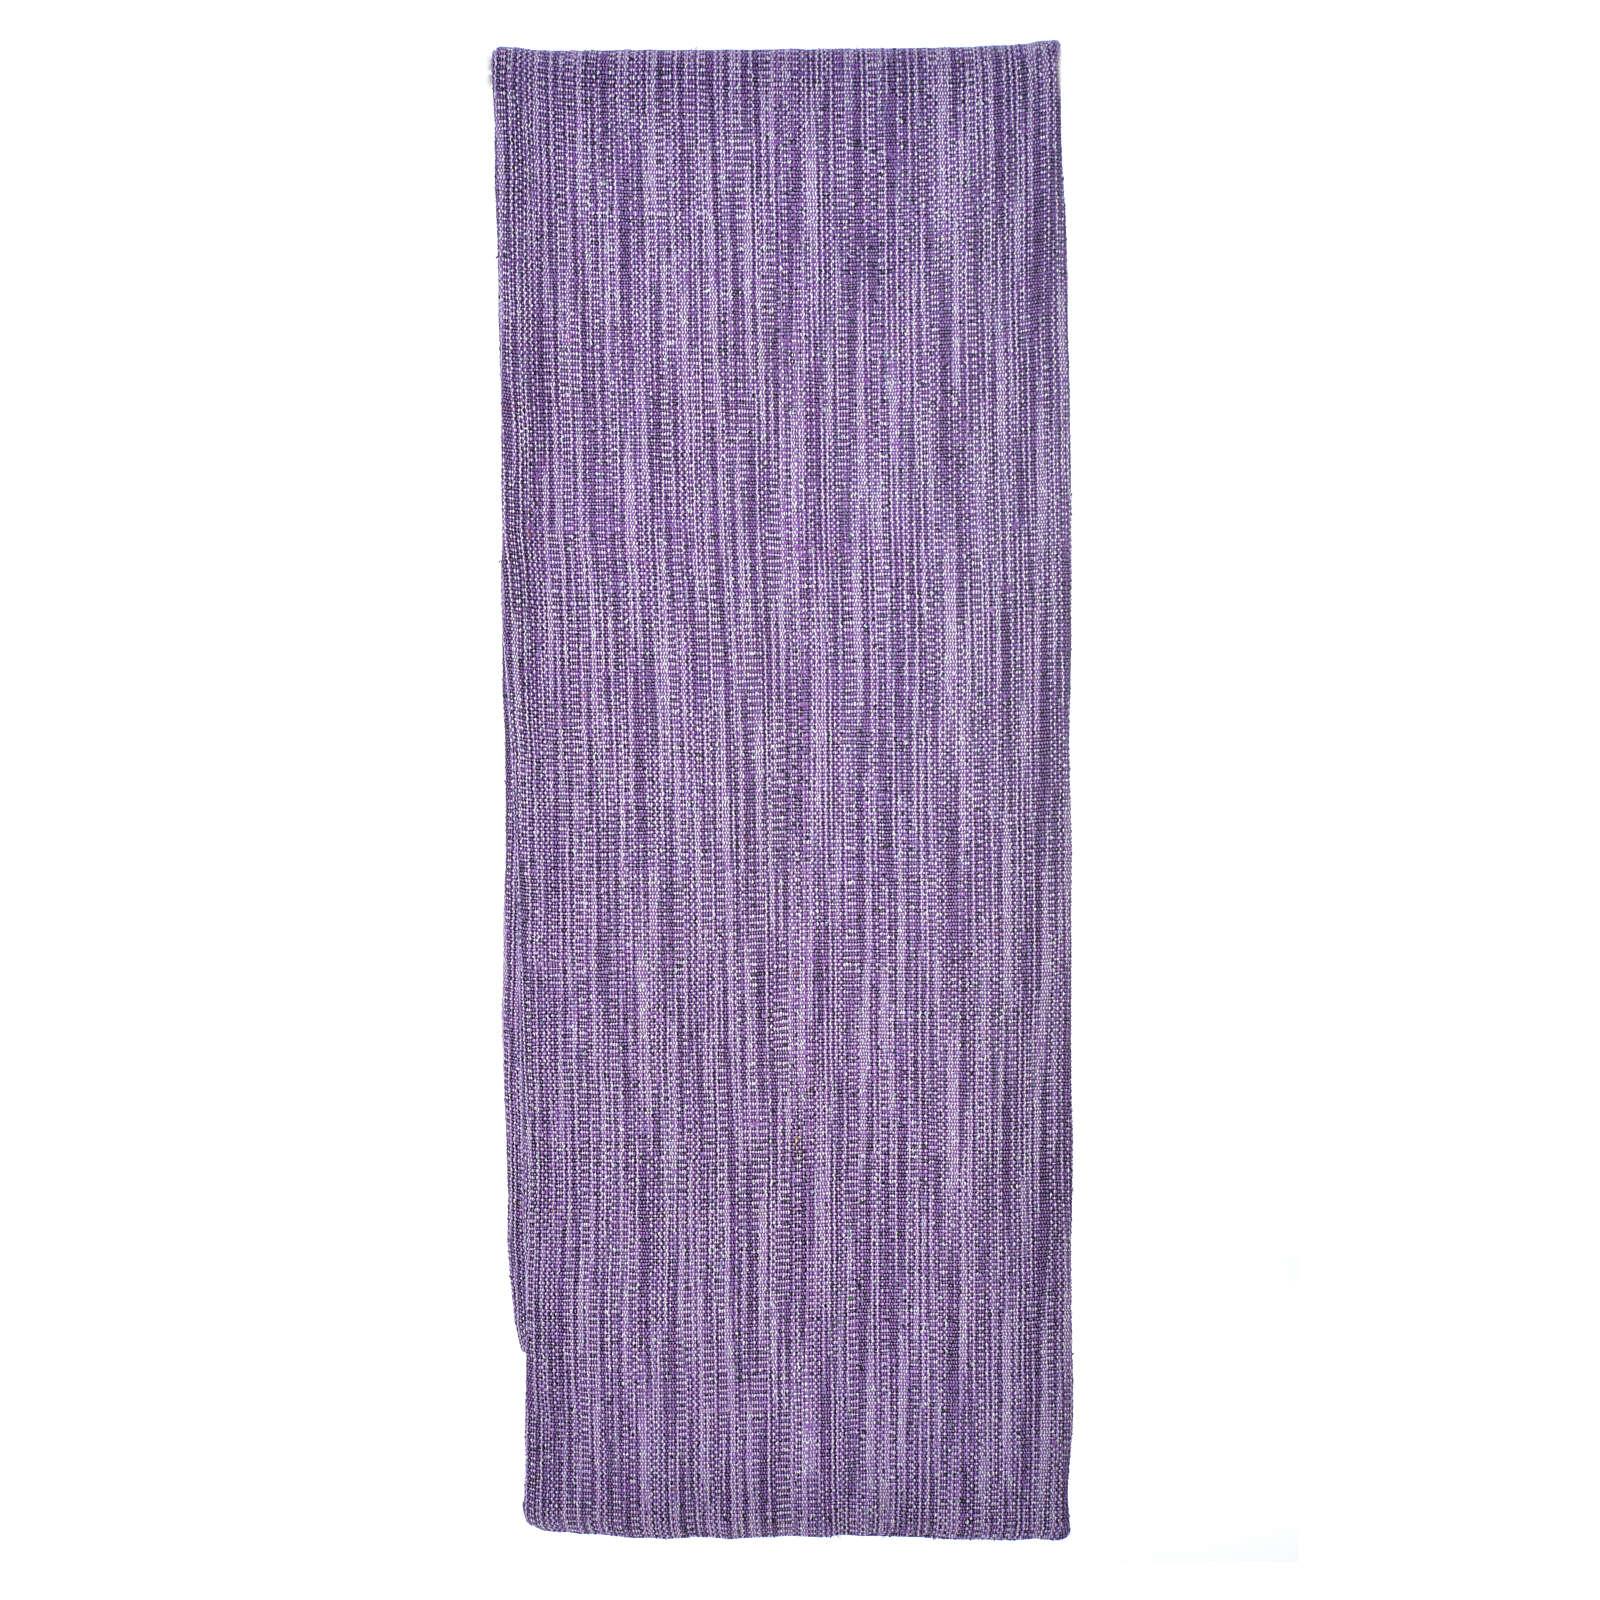 Franciscan lectern cover 65% silk, 35% viscose 4